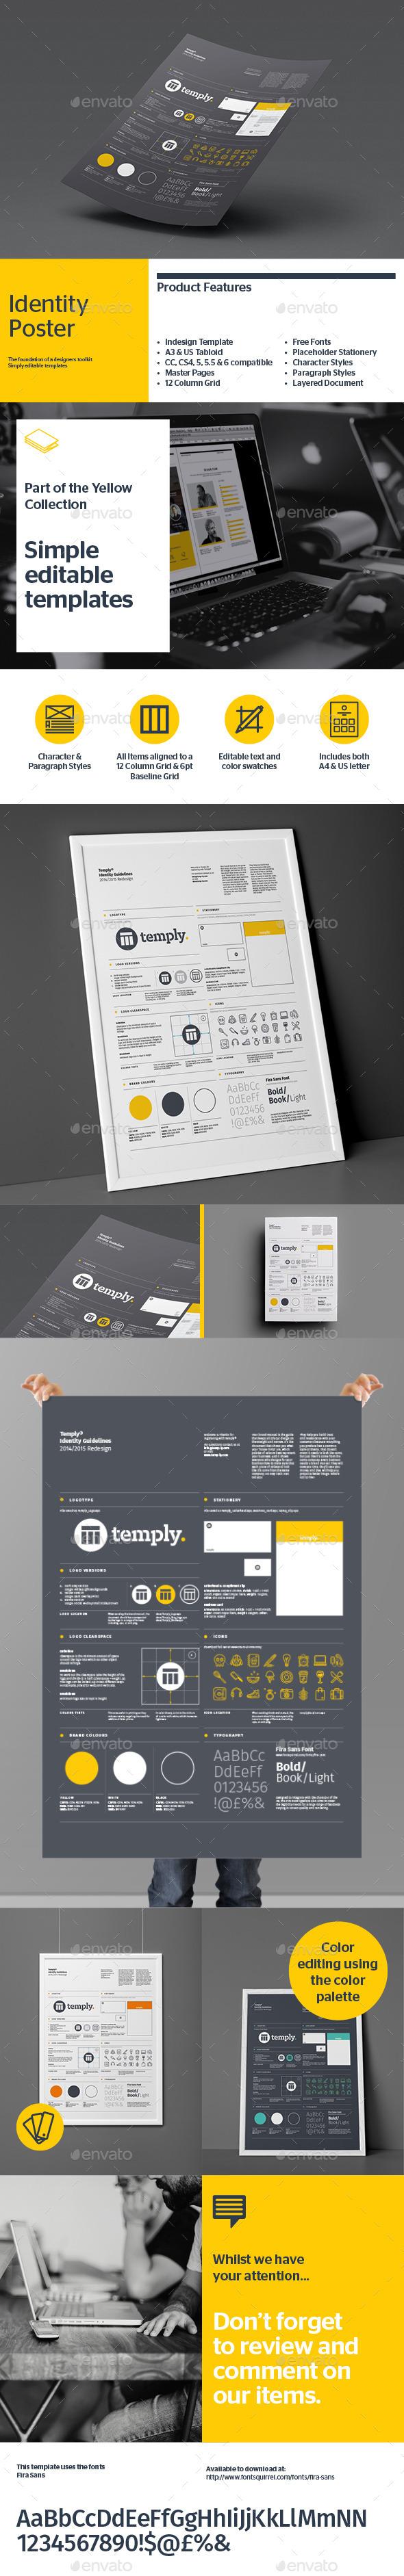 Brand Identity Poster  - Flyers Print Templates